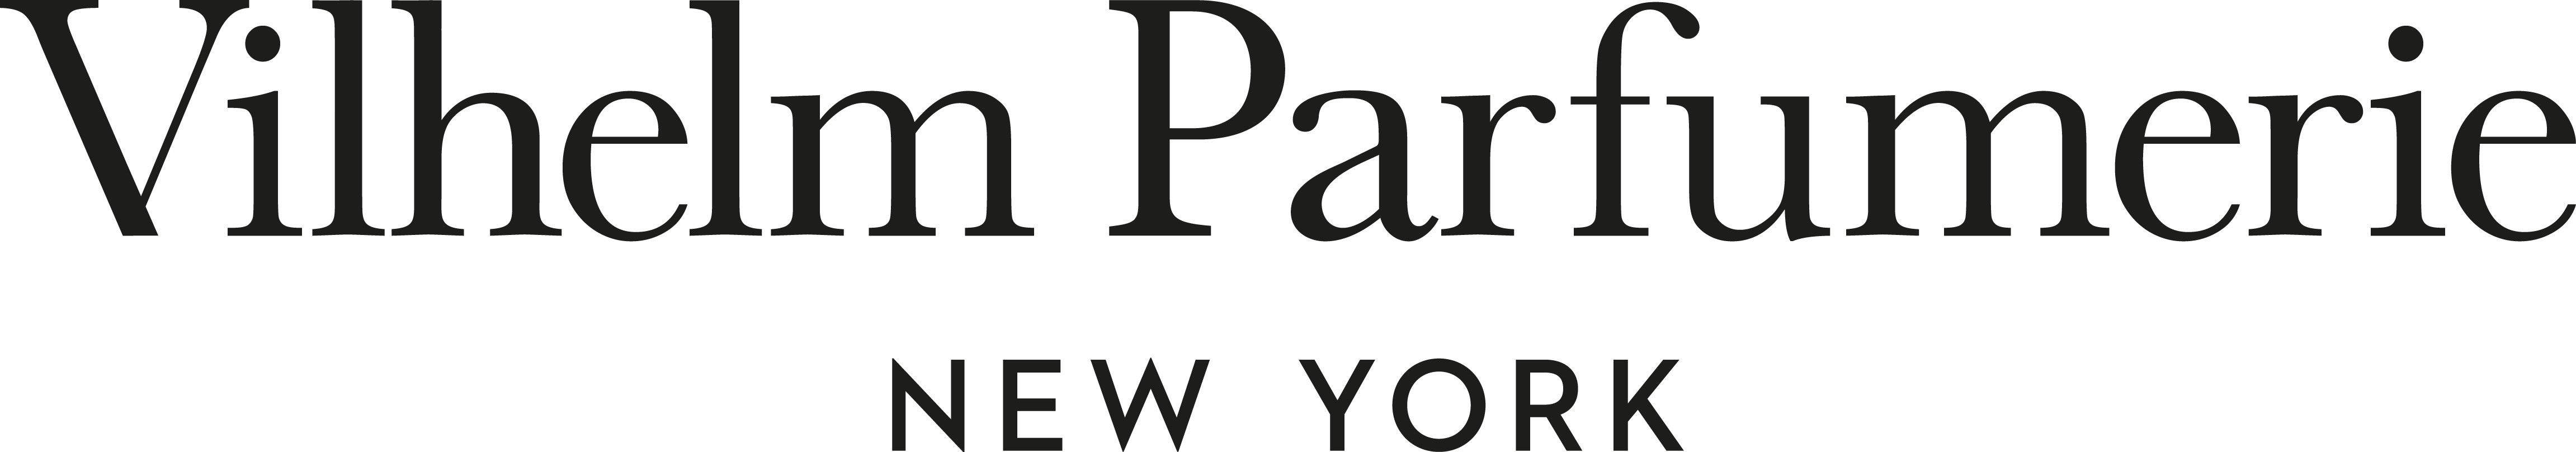 Vilhelm Parfumerie NY